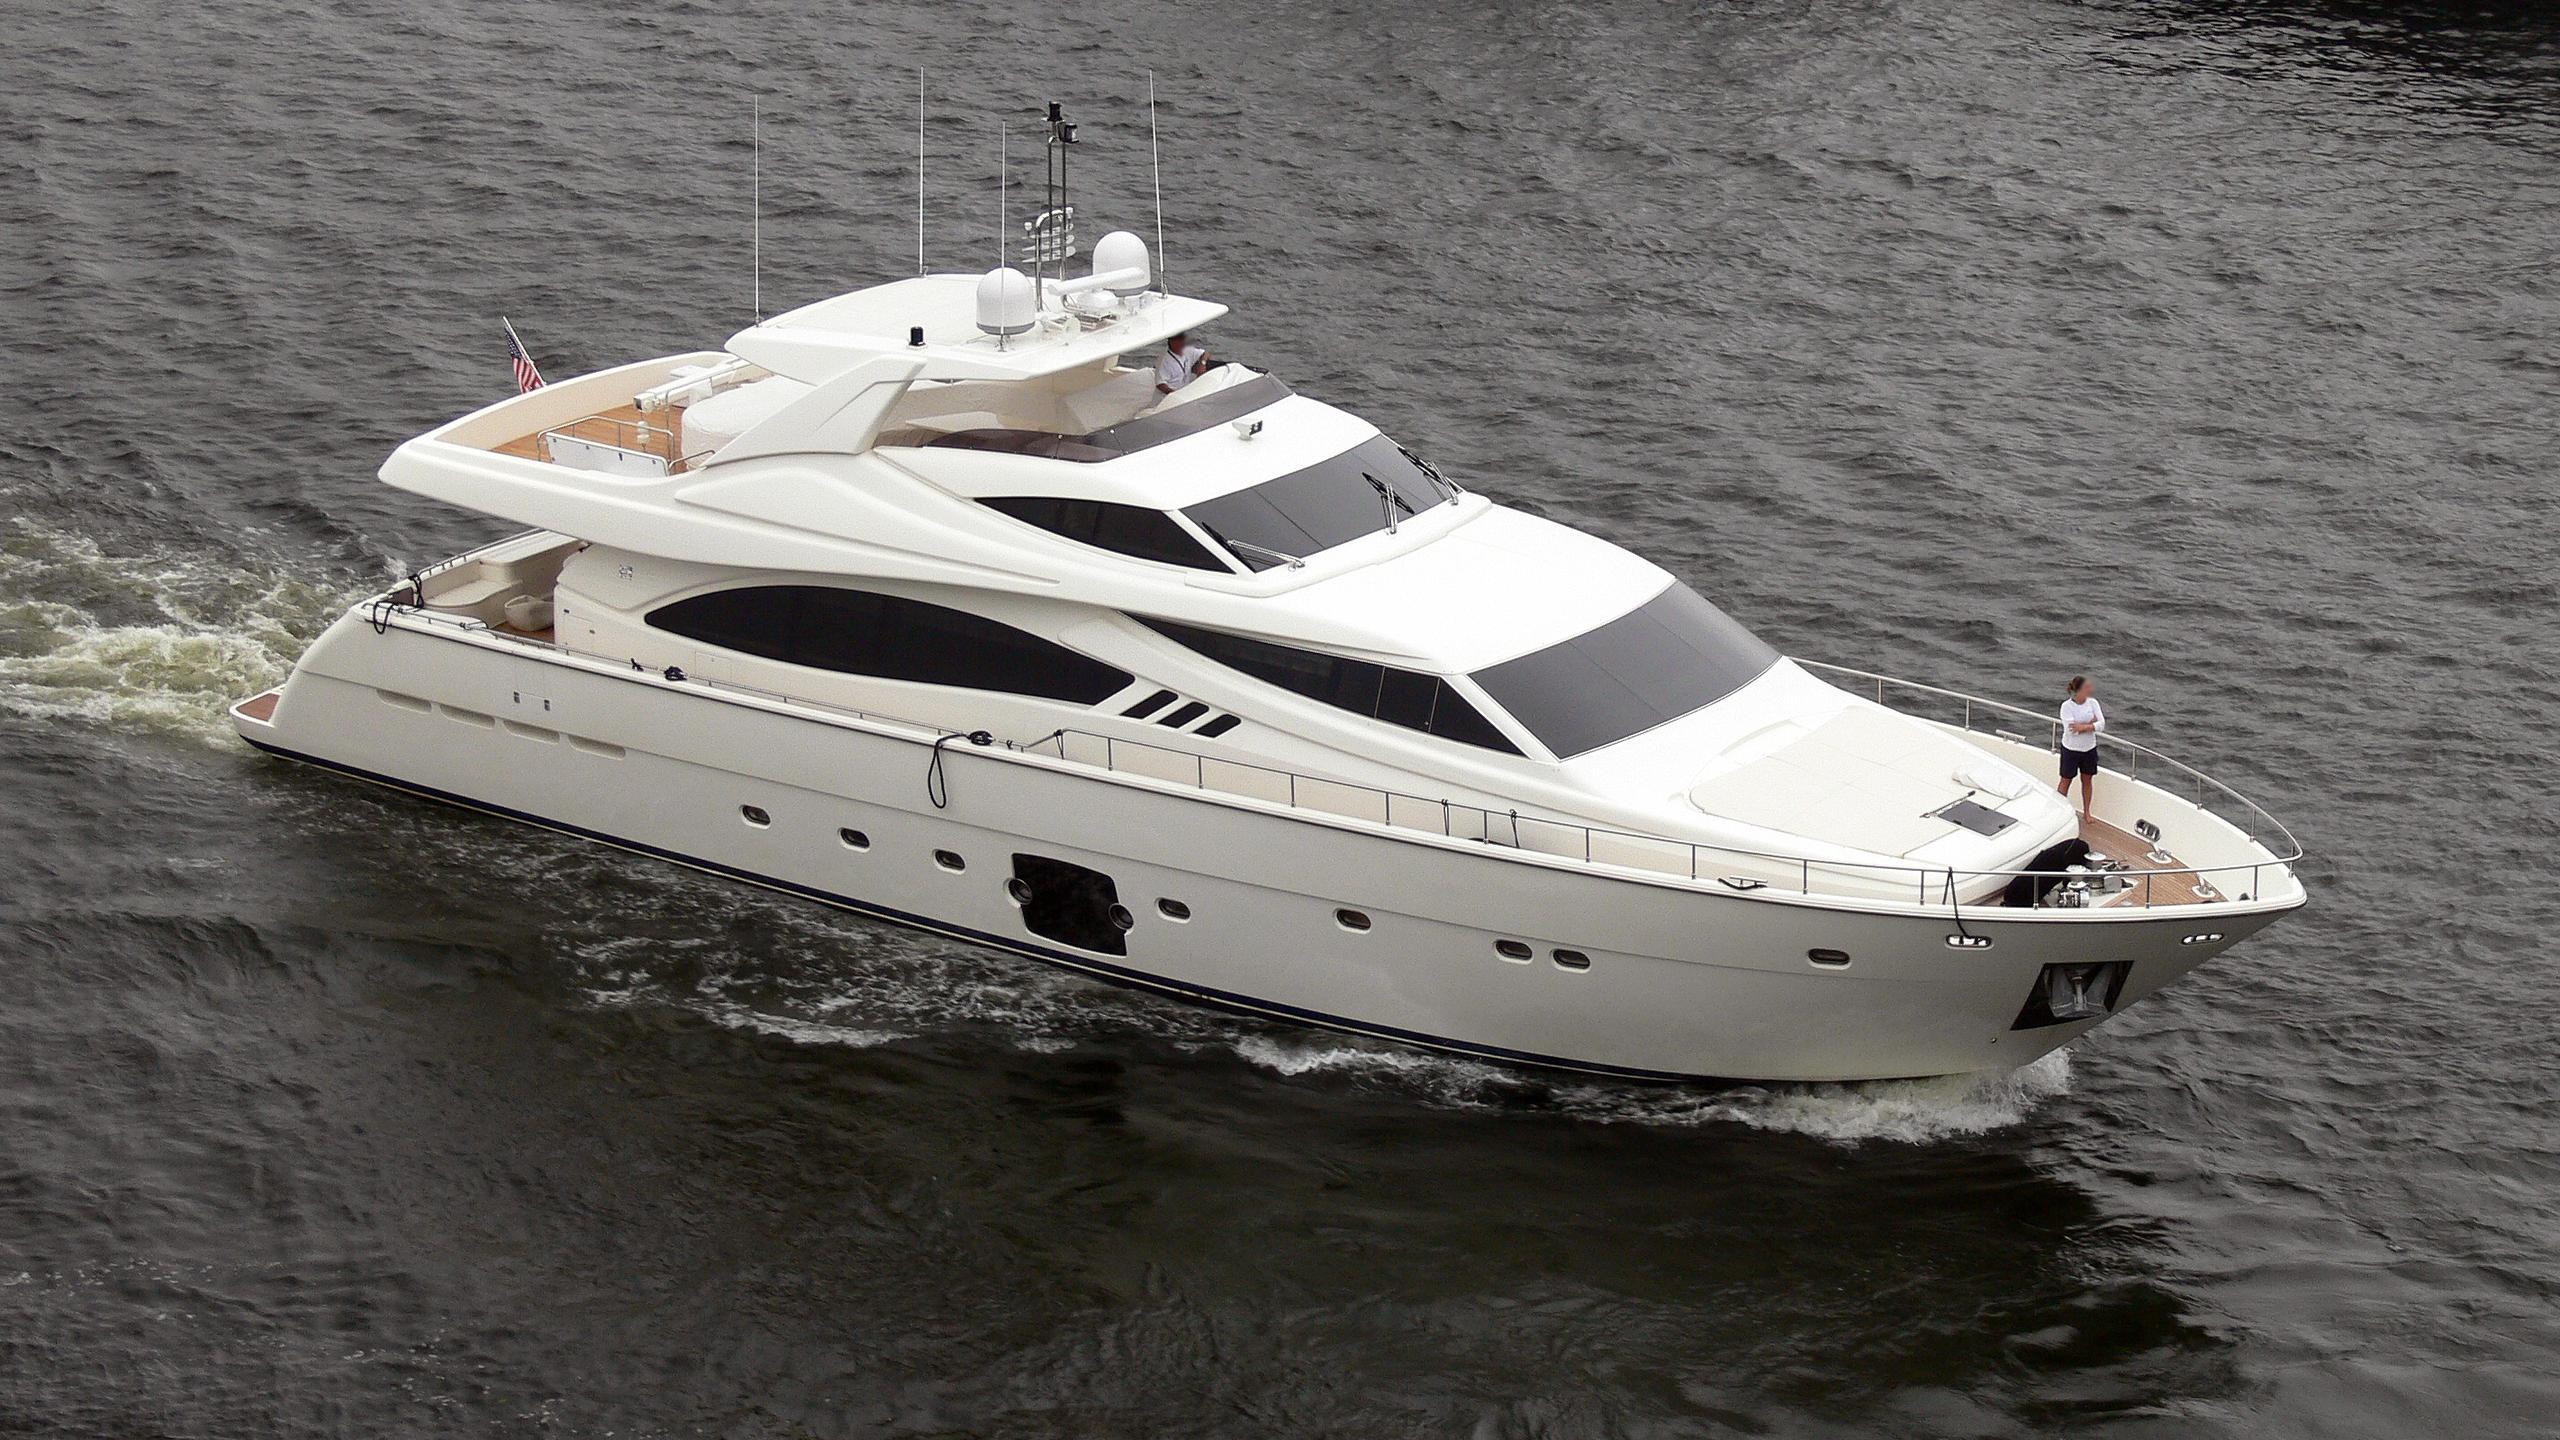 aurora dignitatis motoryacht ferretti 881 rph 2008 27m half profile